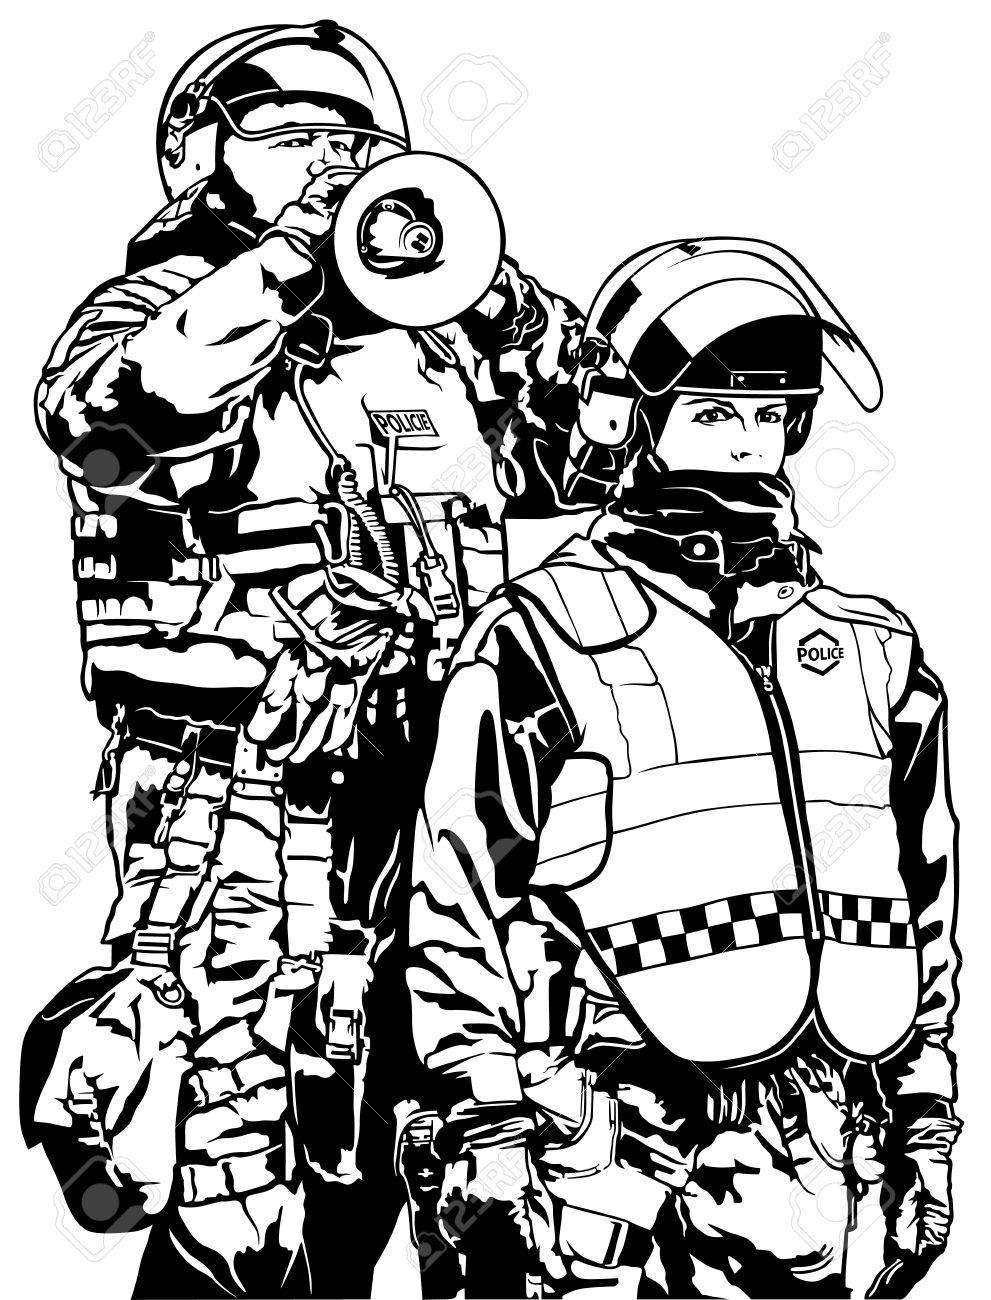 Police Heavy Armor.